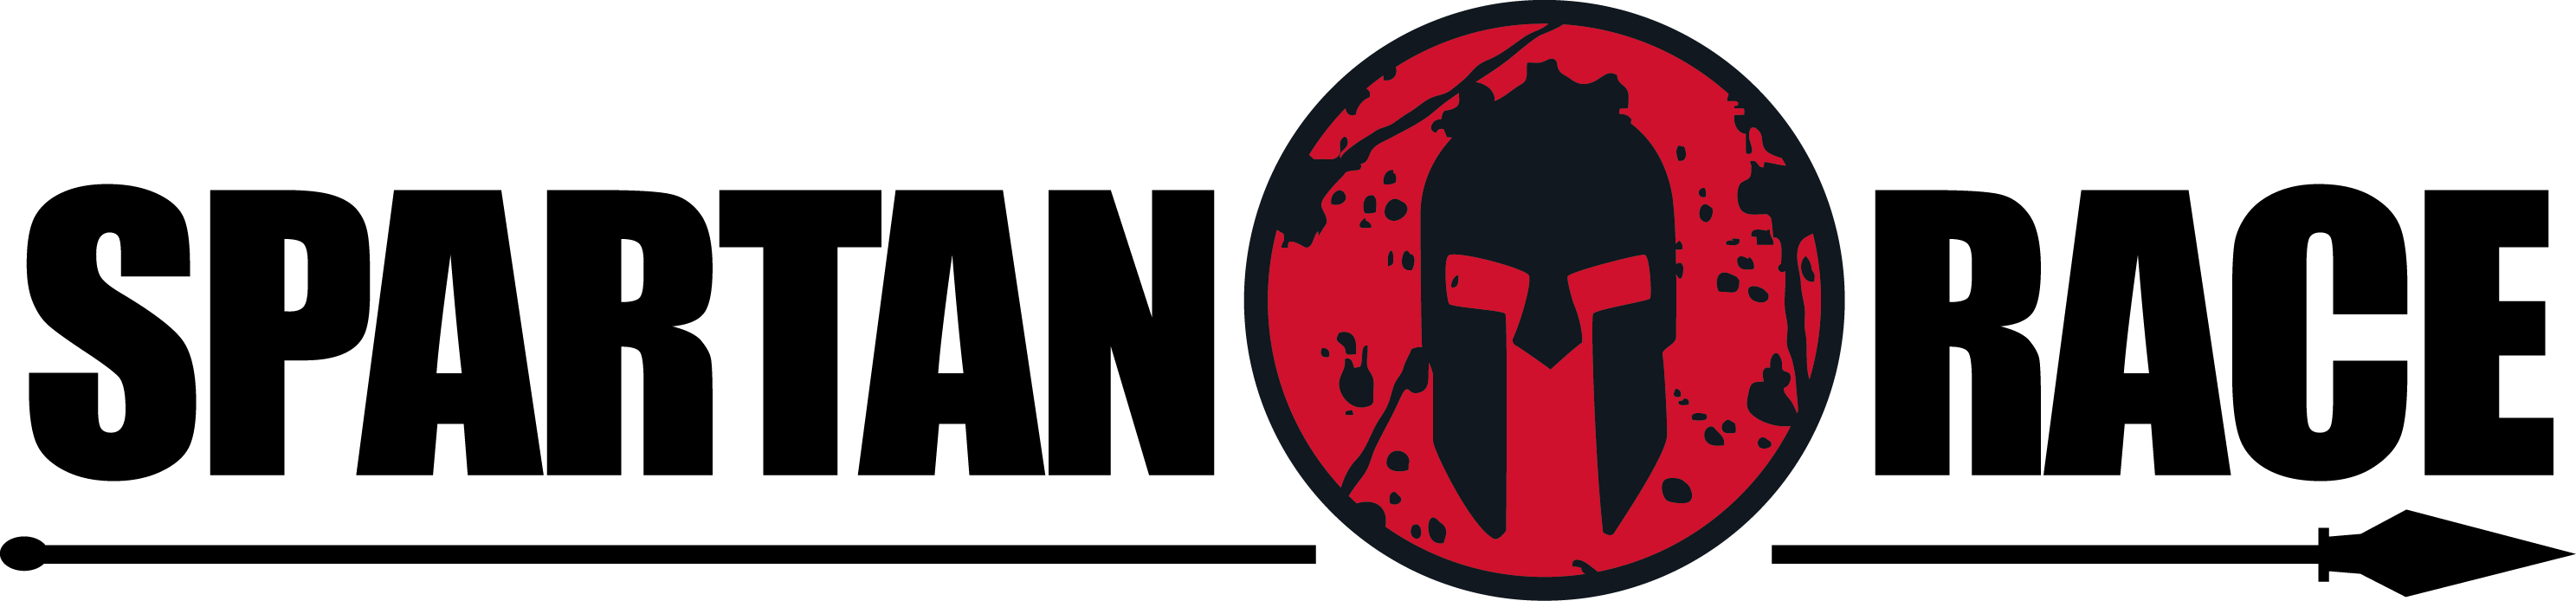 Spartan Race Logo Vector Eps Free Download Logo Icons Clipart Spartan Logo Spartan Race Logo Spartan Race [ 694 x 2975 Pixel ]